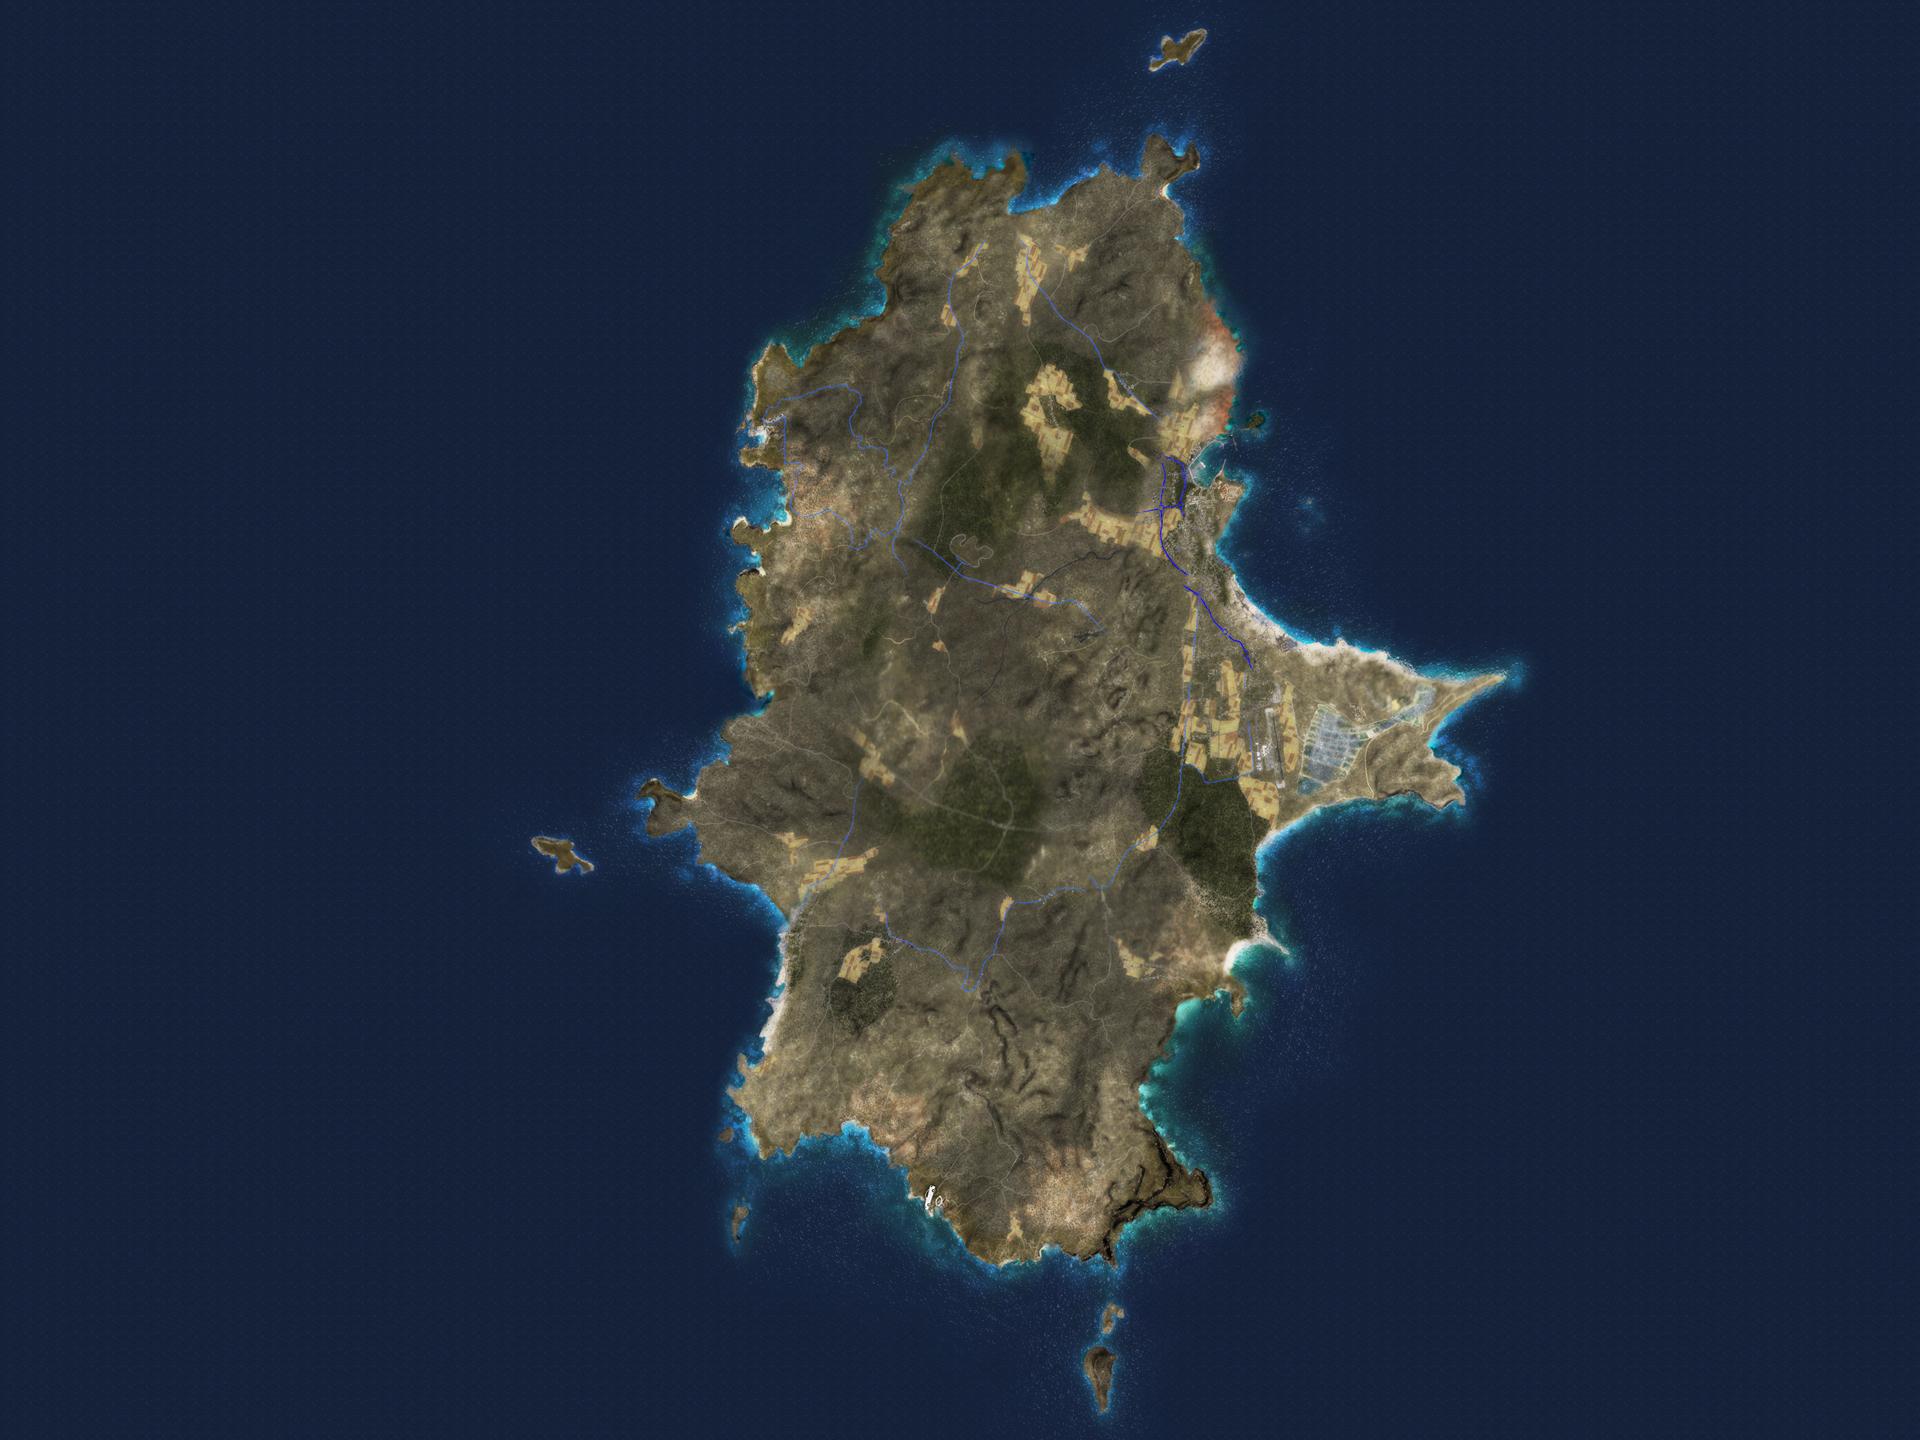 File:Ibiza.jpg